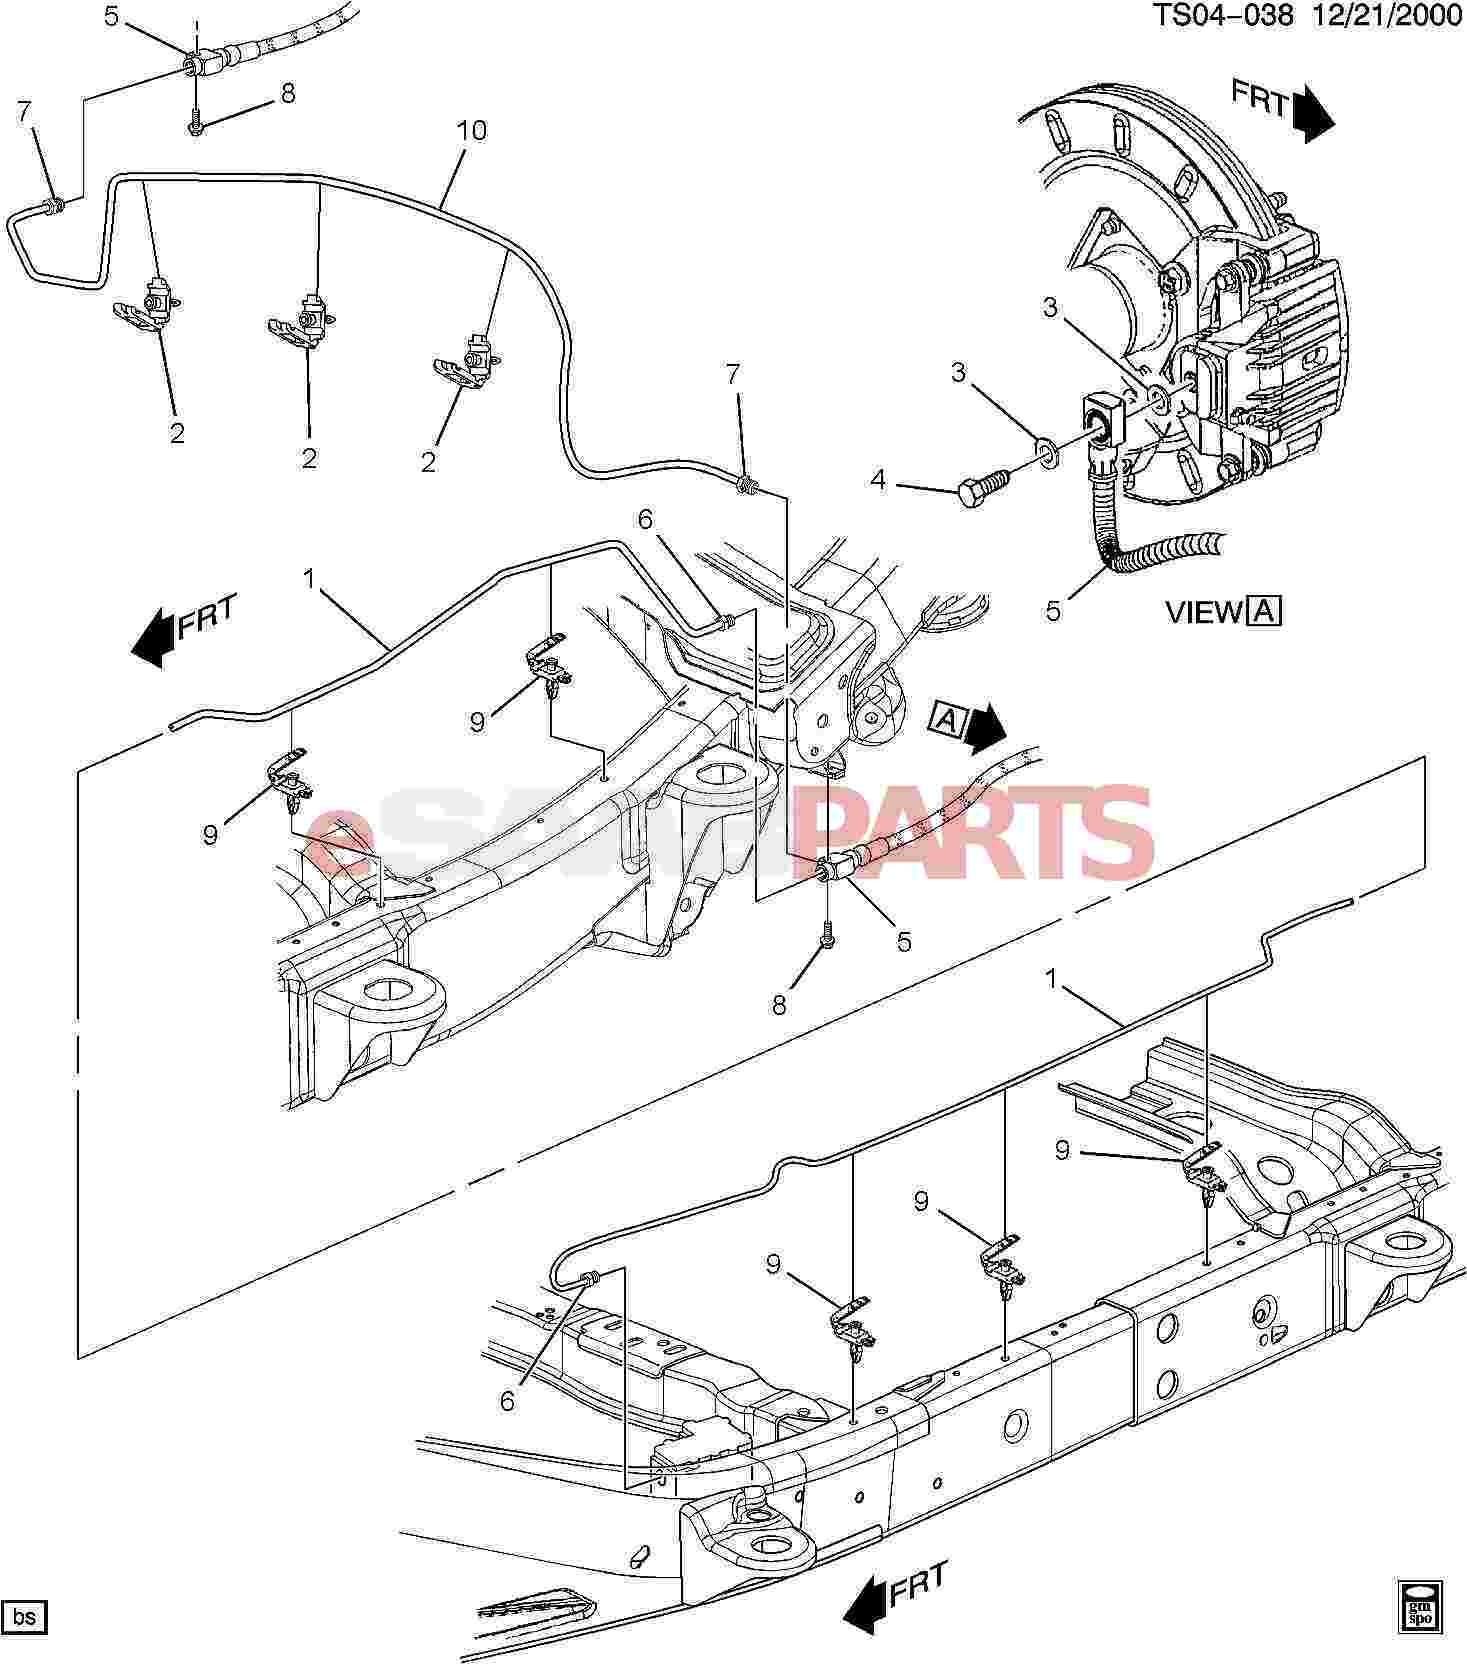 gmc envoy parts diagram esaabparts saab 9 7x brakes parts